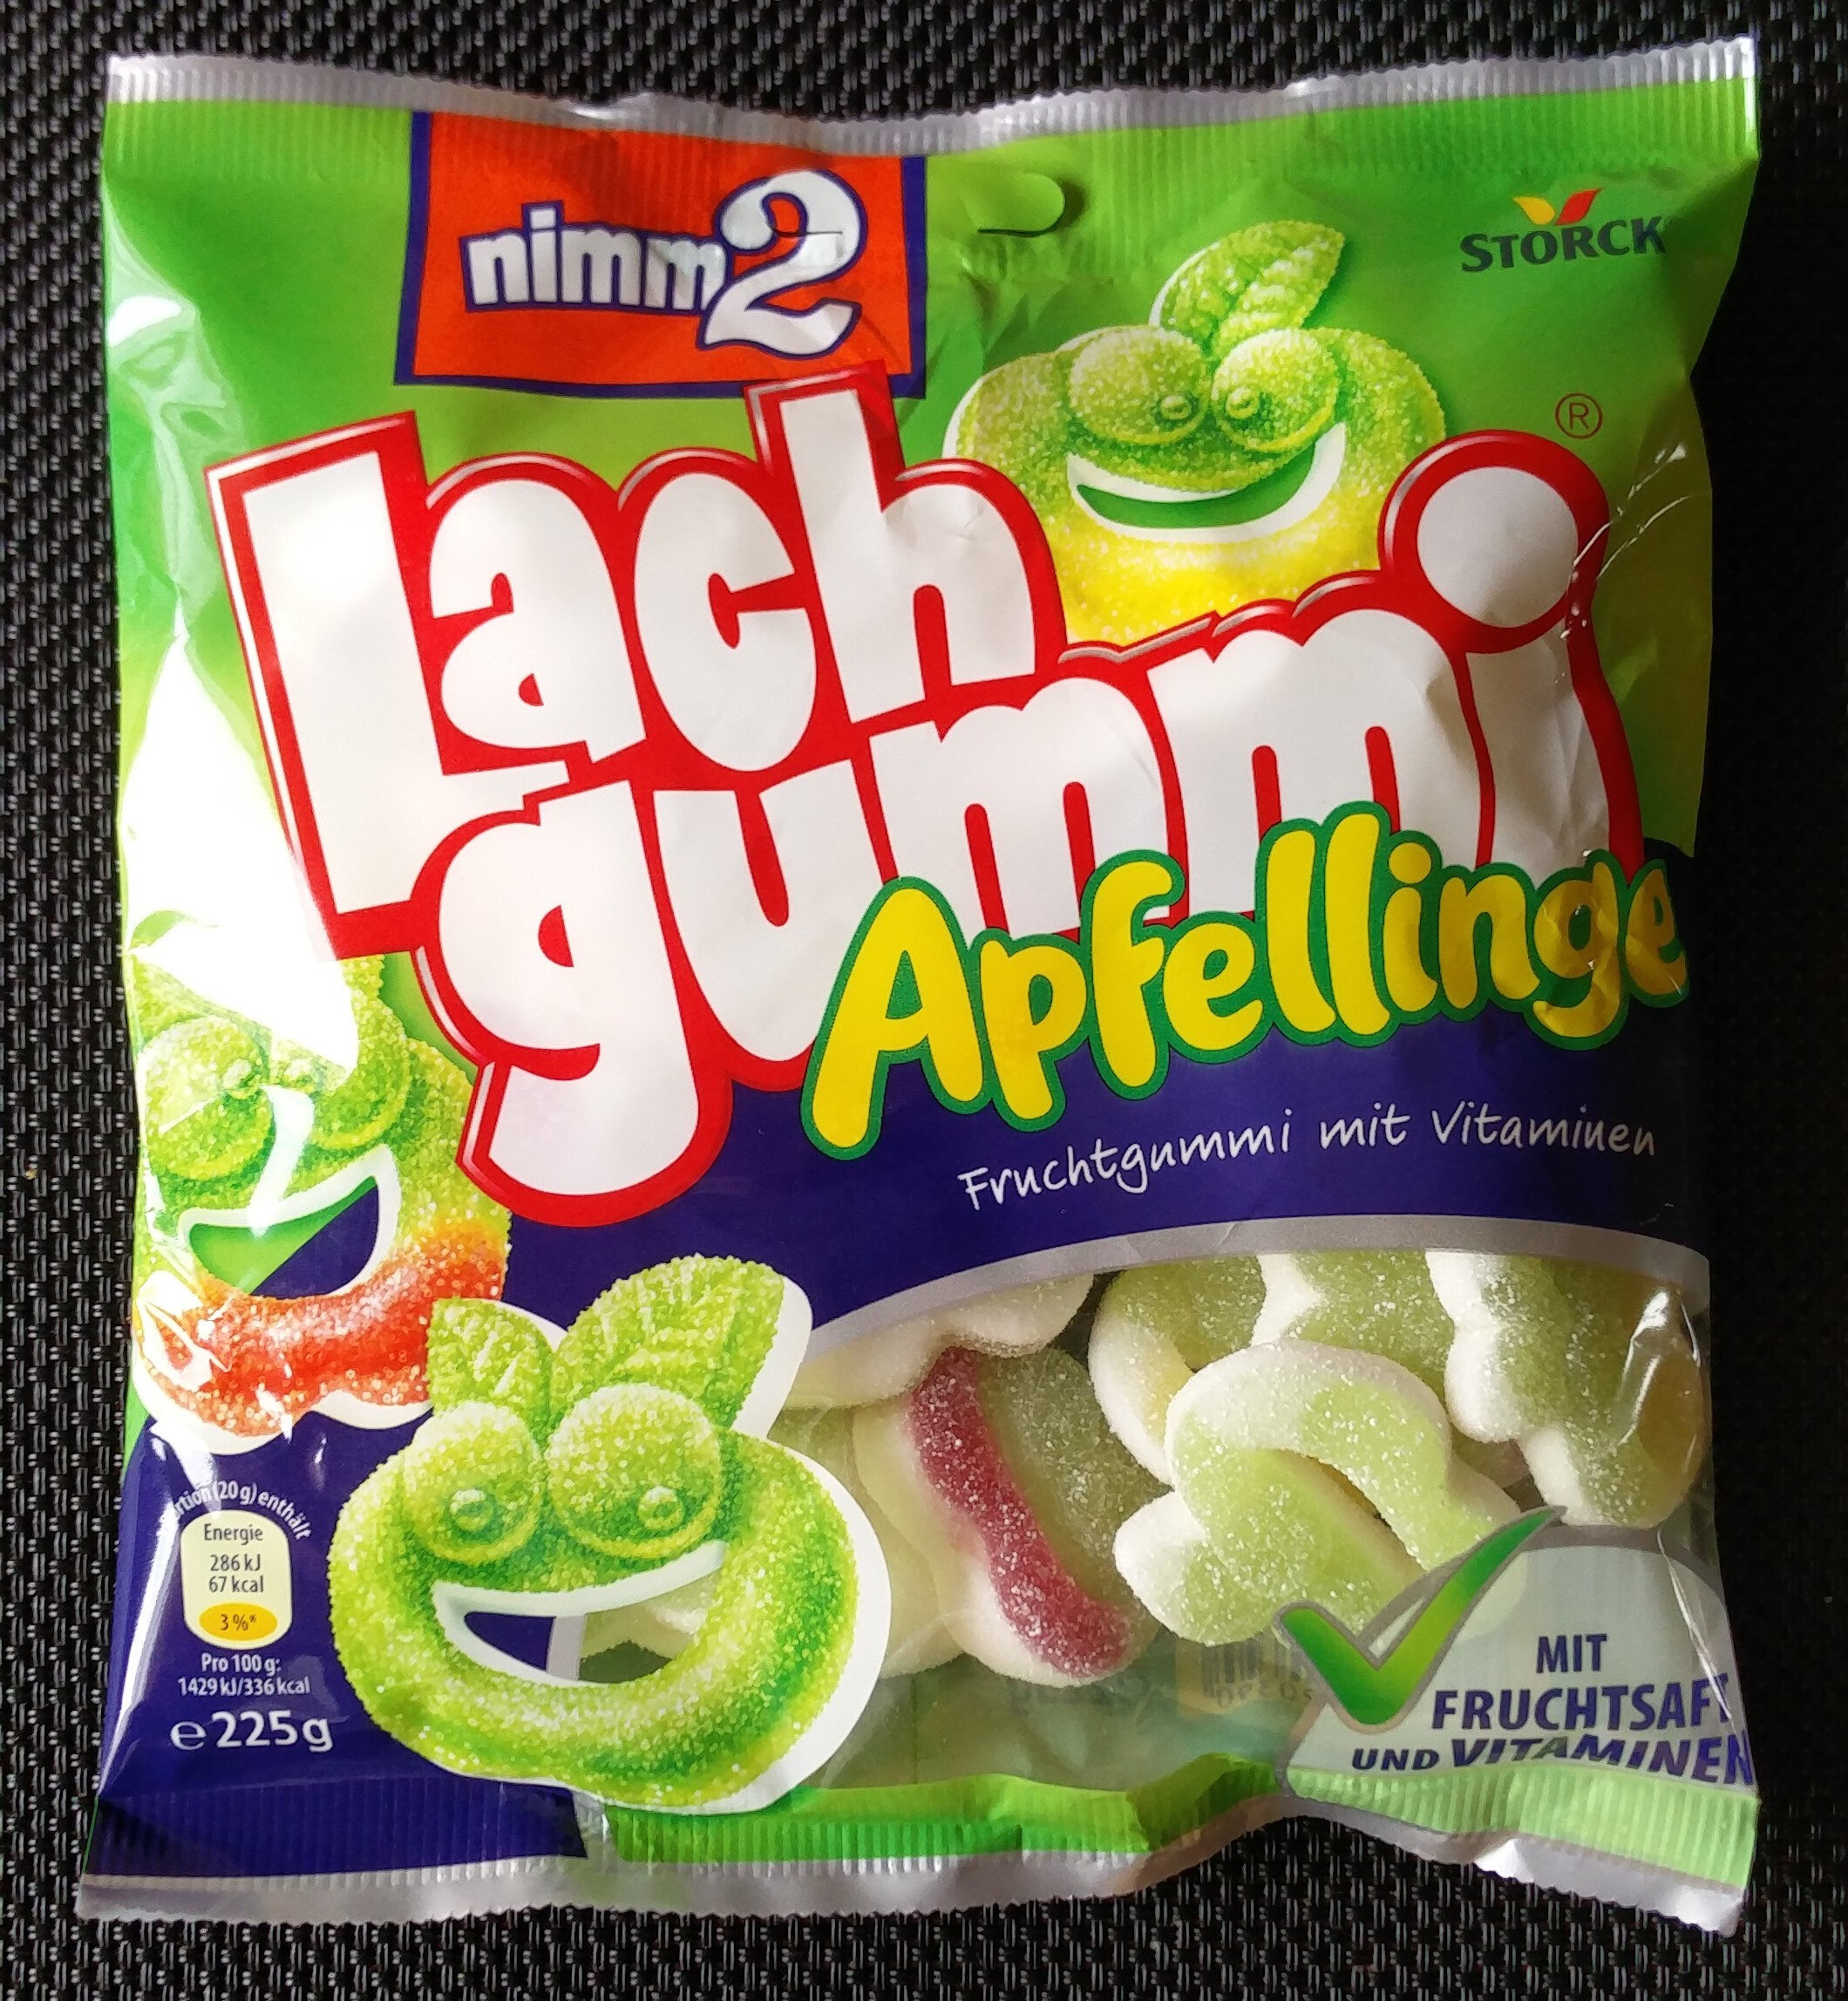 Lachgummi Apfellinge - Product - de